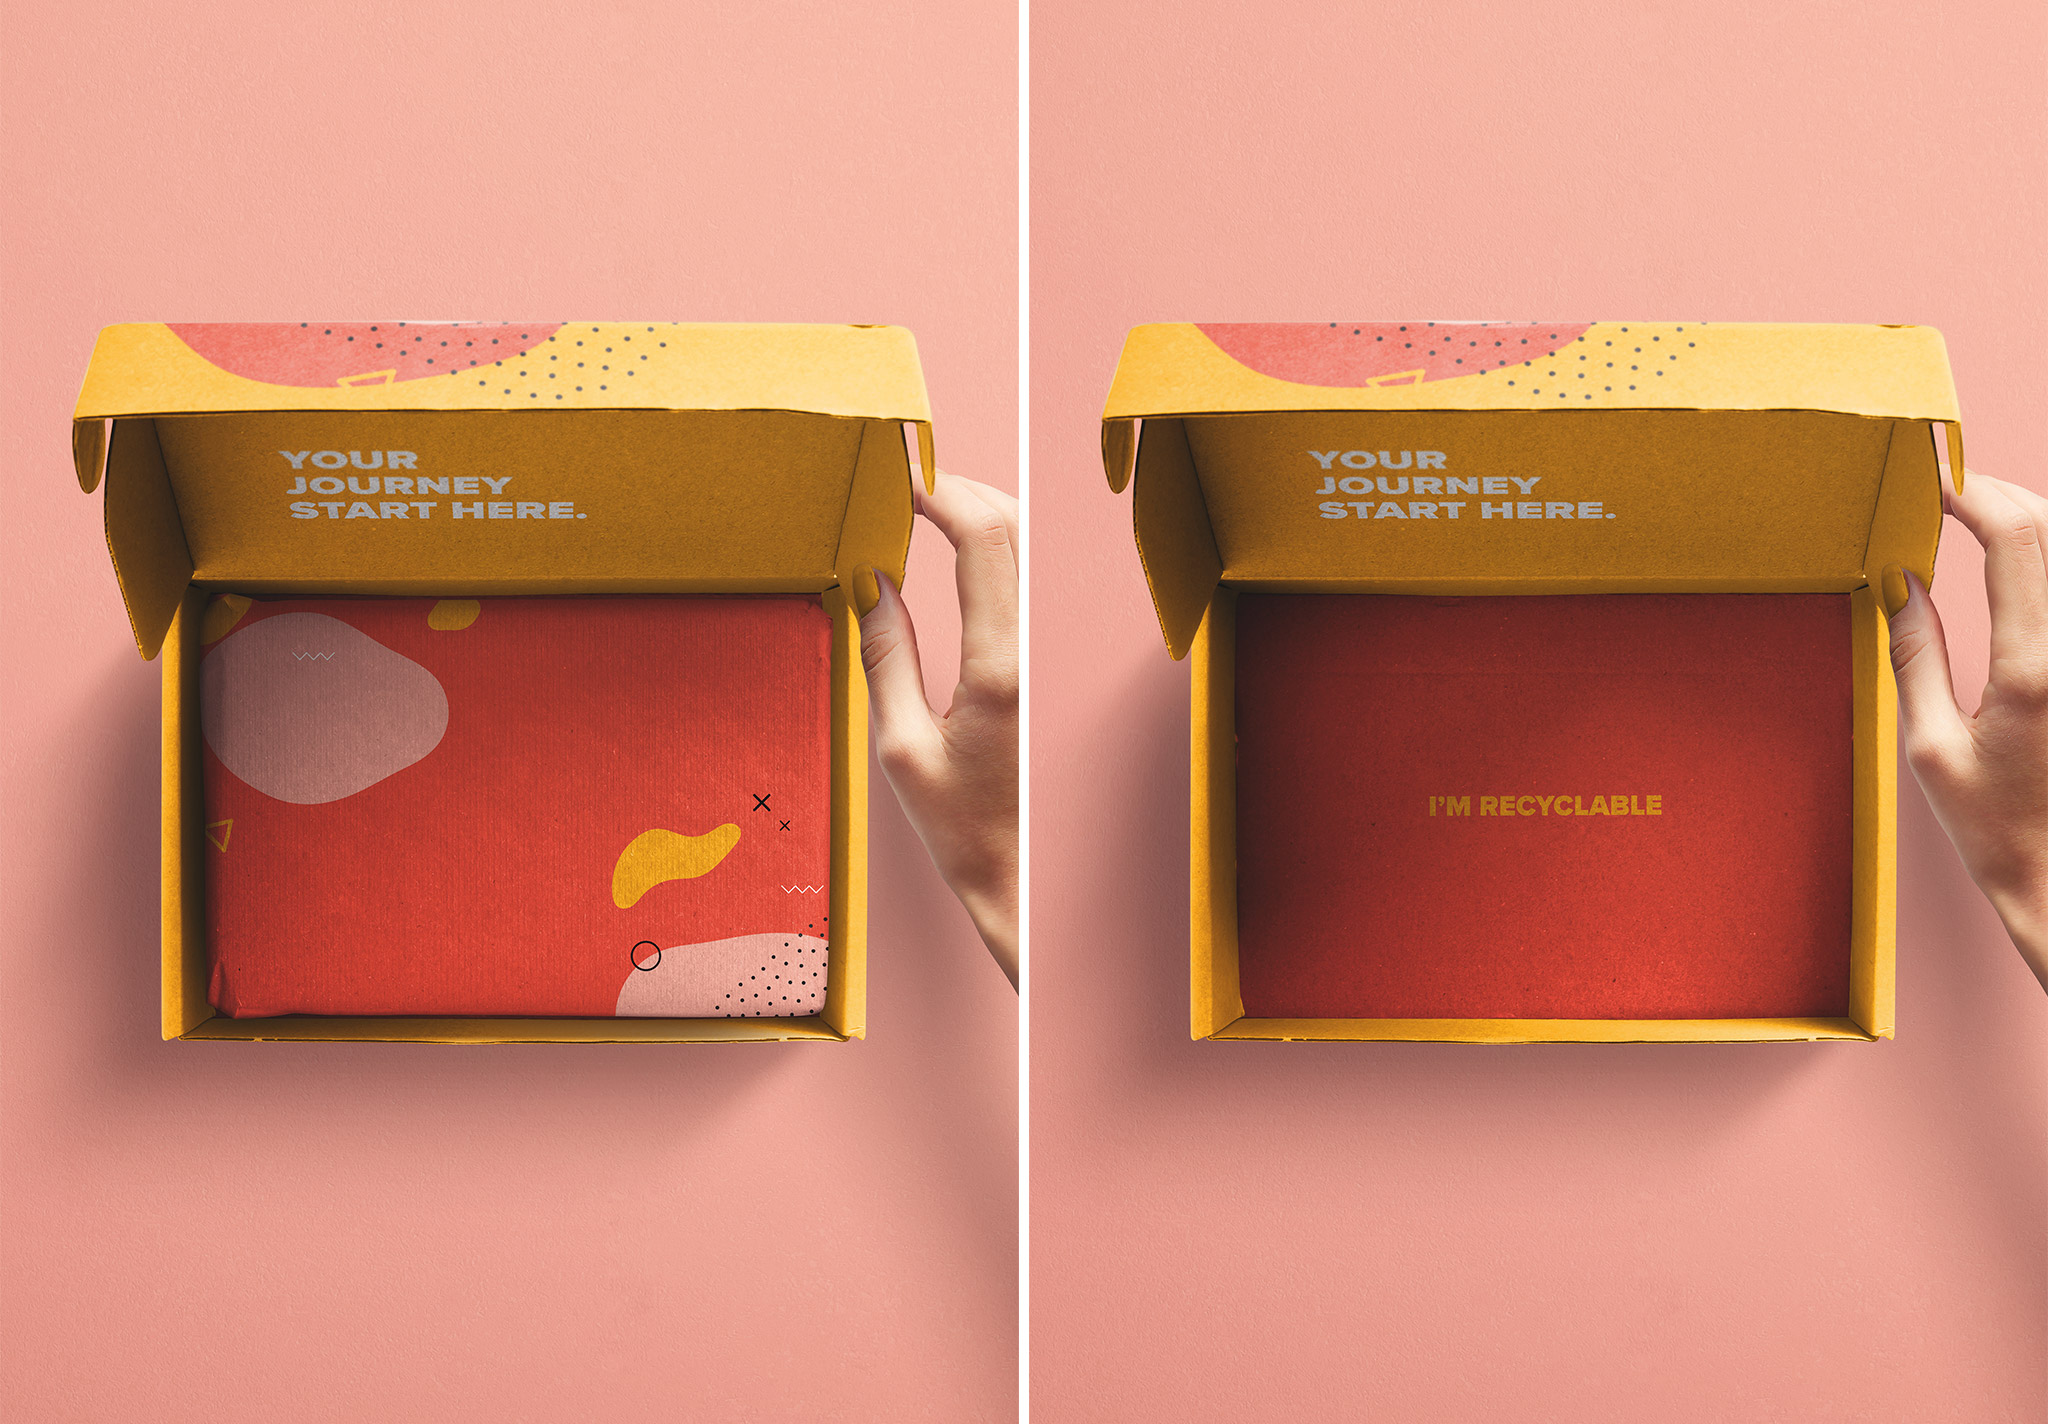 Hand Holding Opened Postal Box Lid Mockup image03